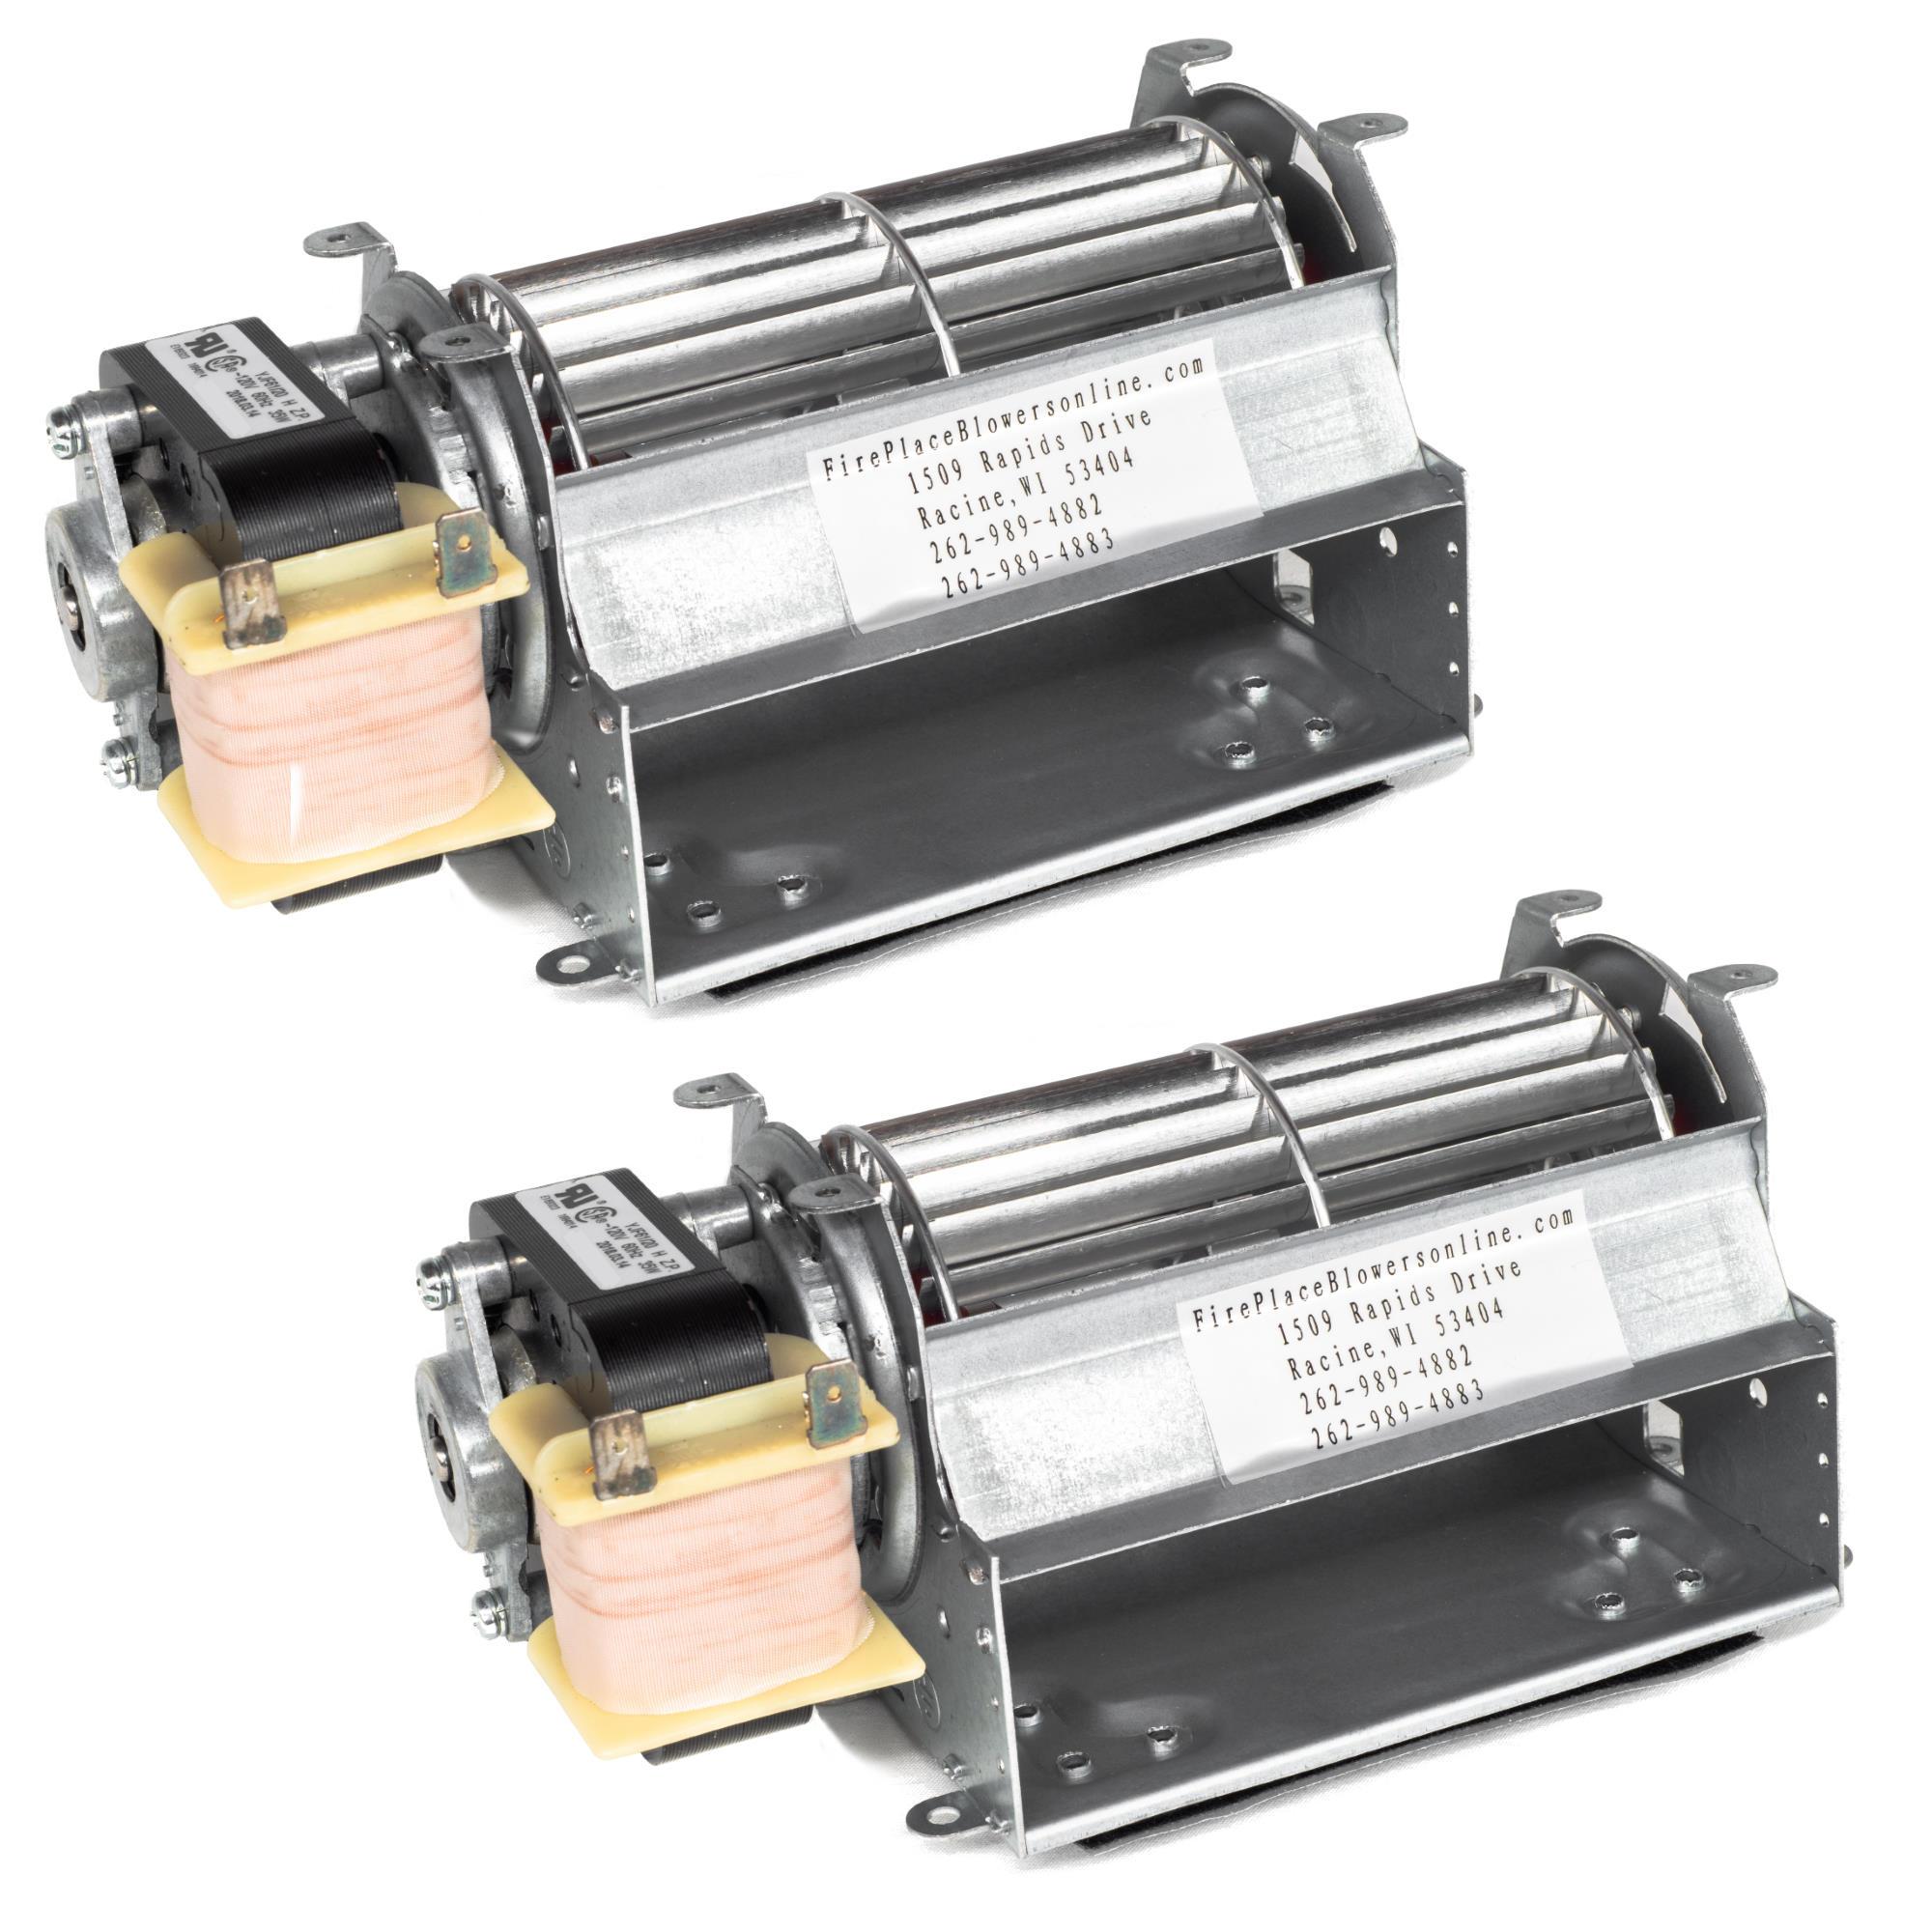 BLOTBLDV, BLOTSDV Blower Motor Replacement Bundle | Majestic, Monessen Fireplaces